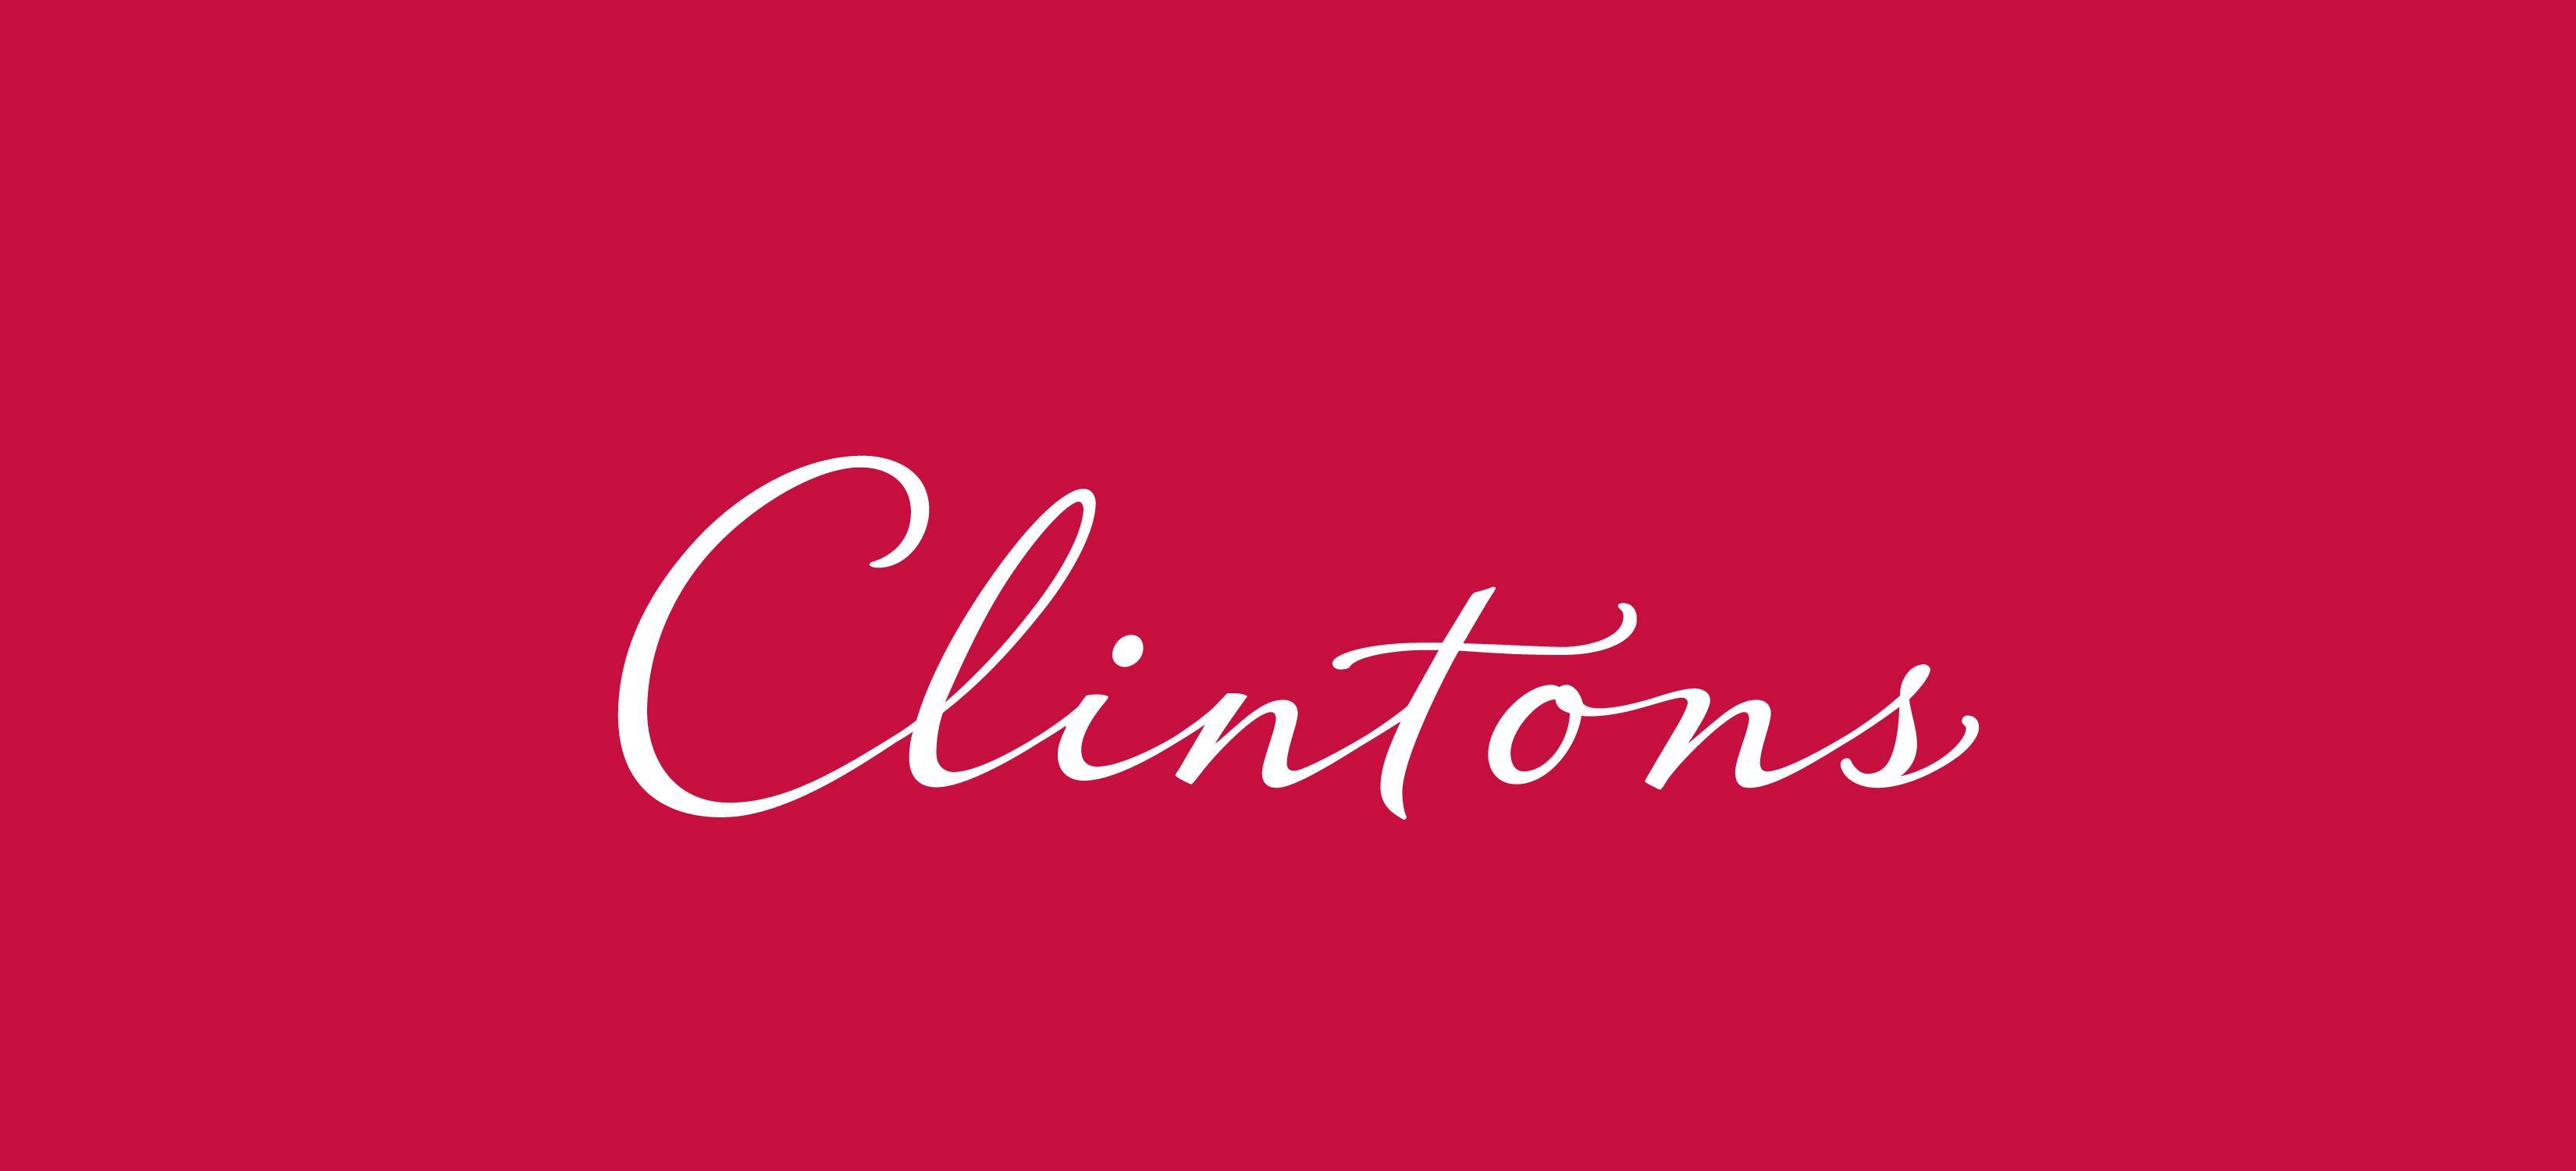 Clinton's Cards